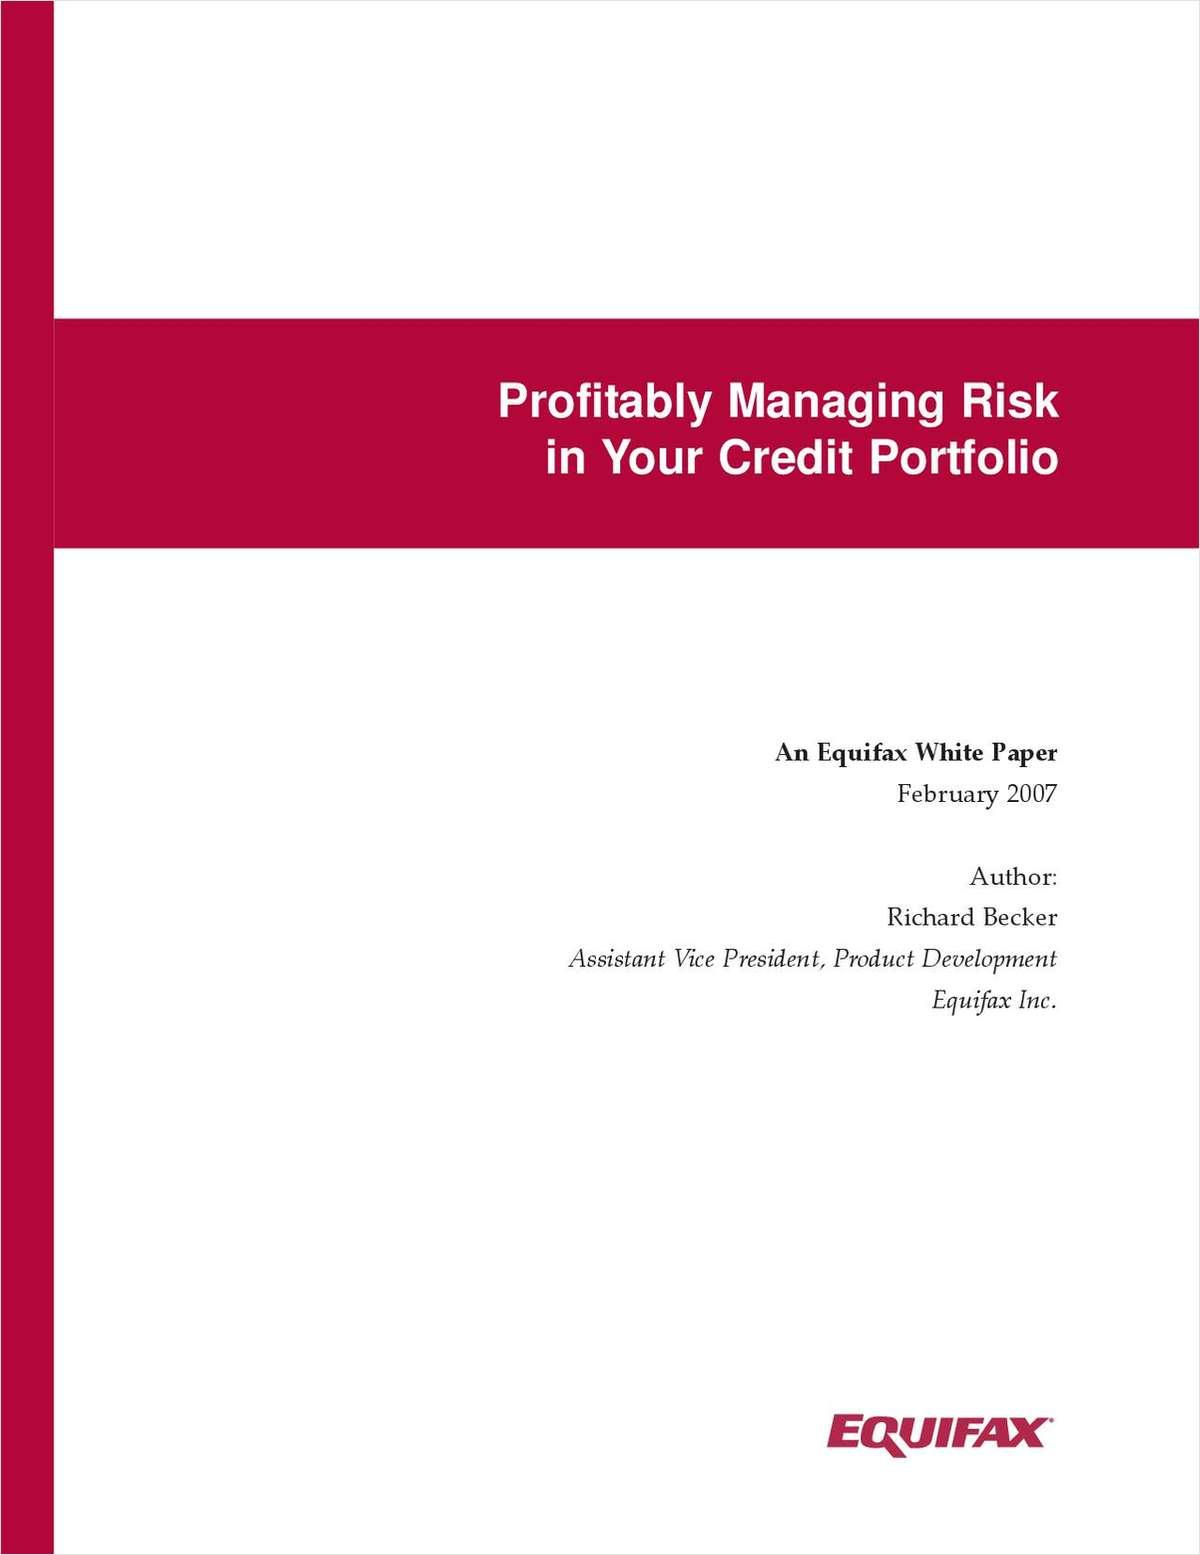 Profitably Managing Risk in Your Credit Portfolio